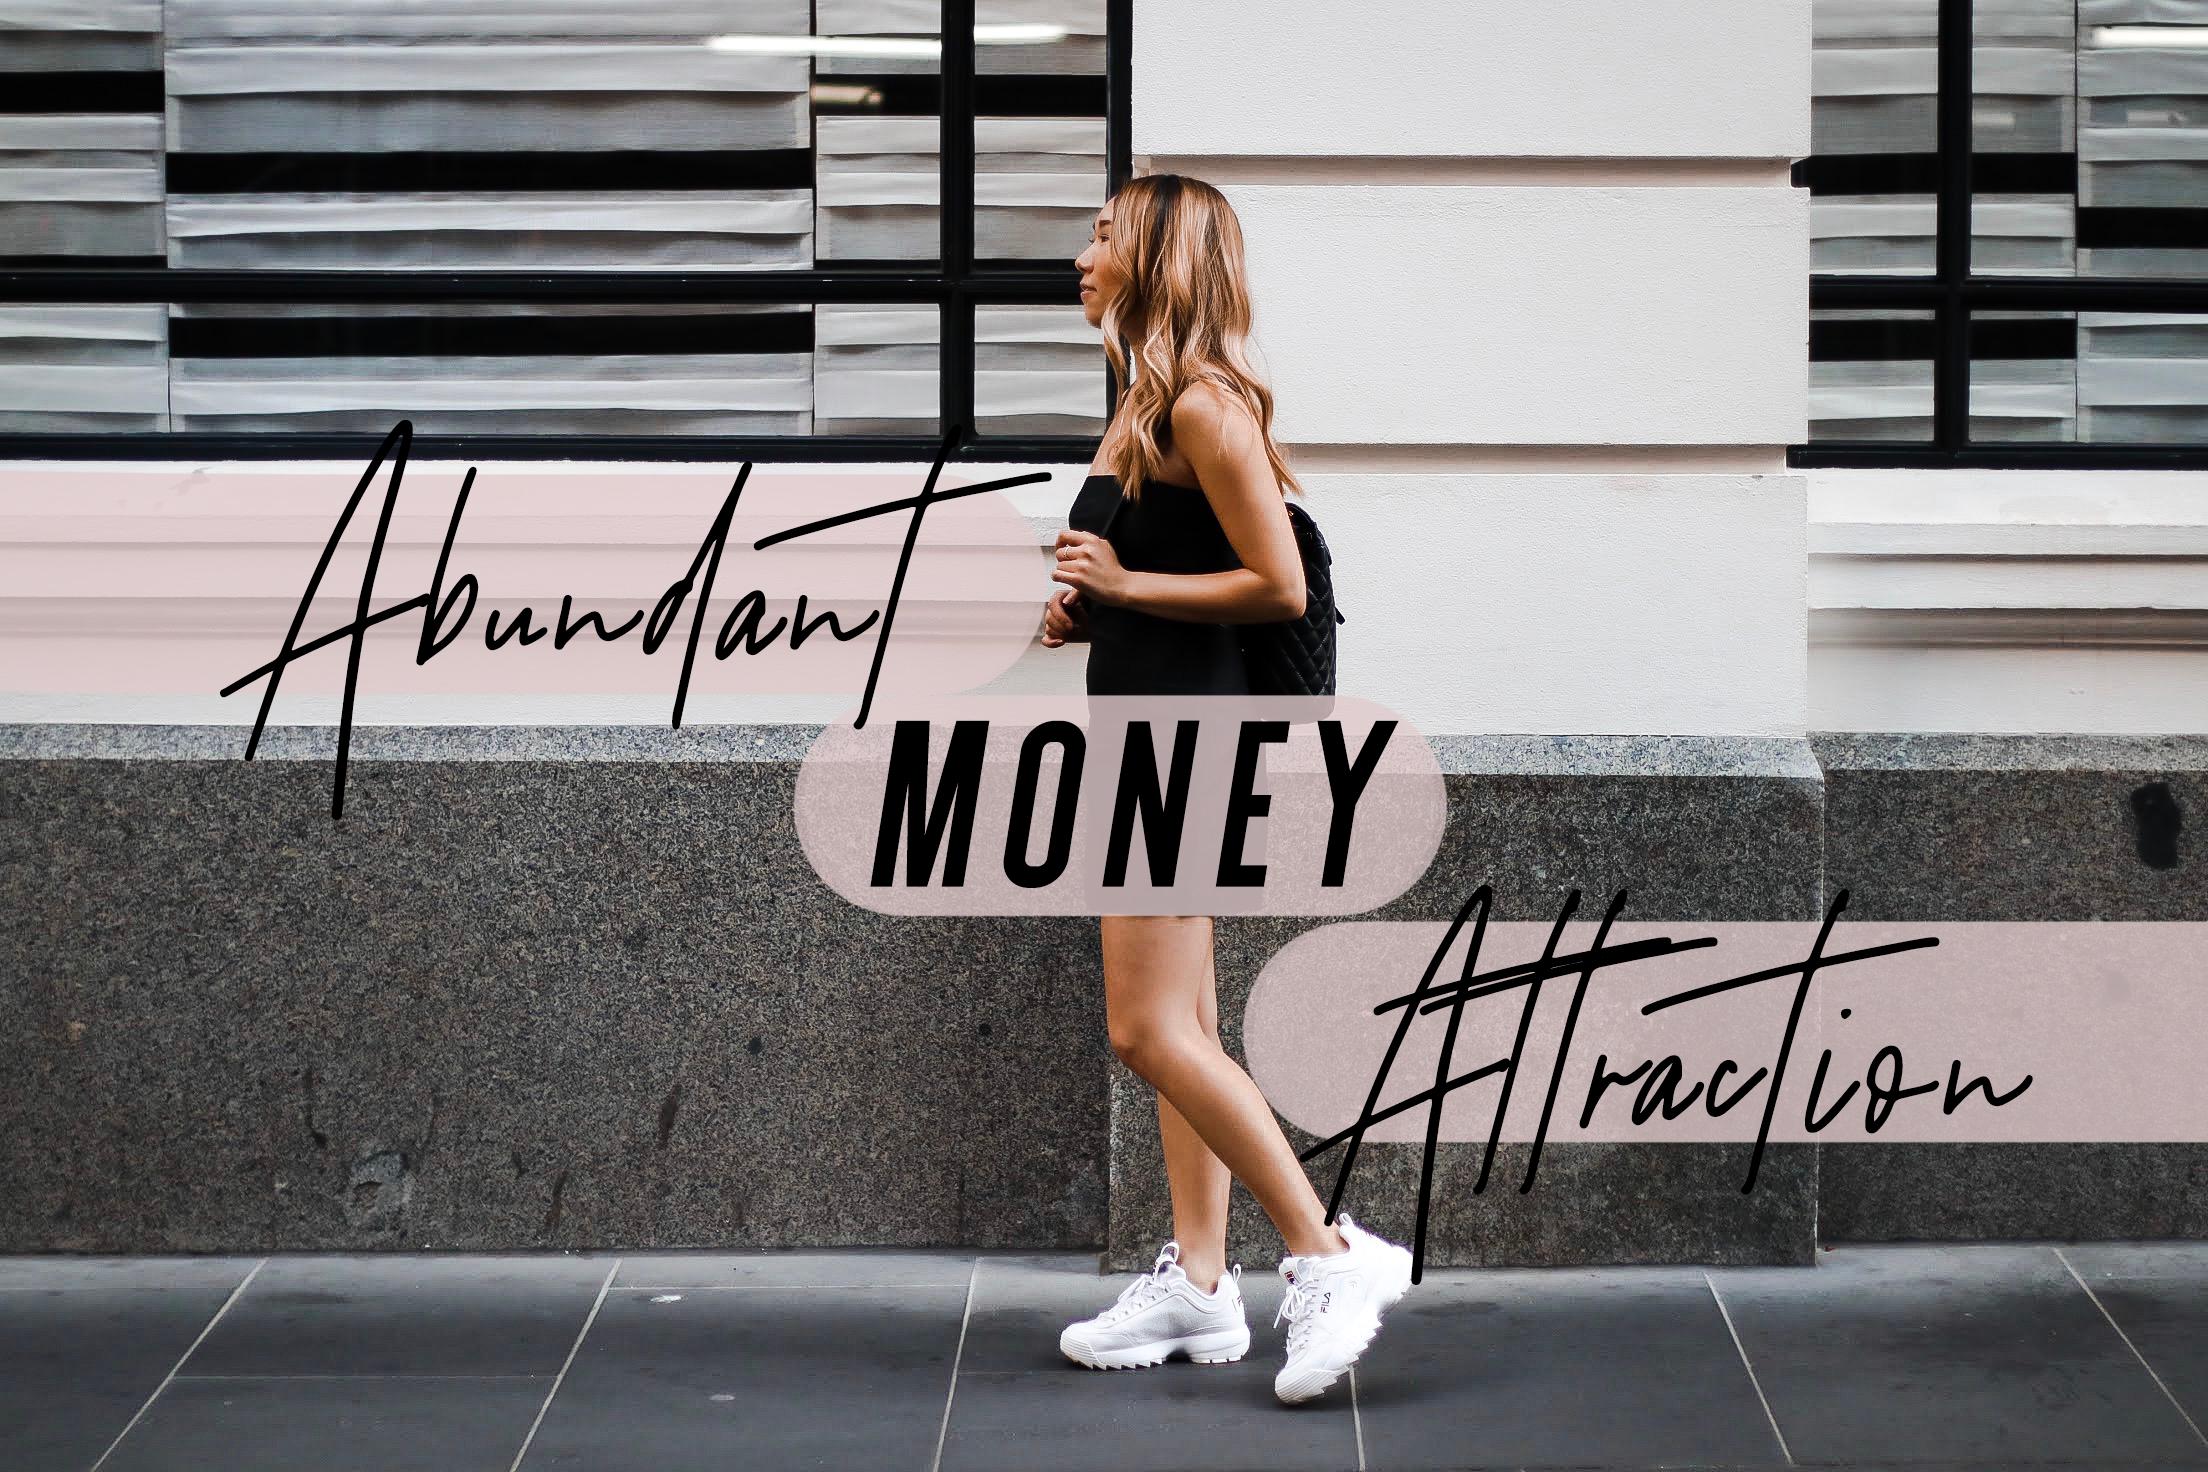 abundant money attraction